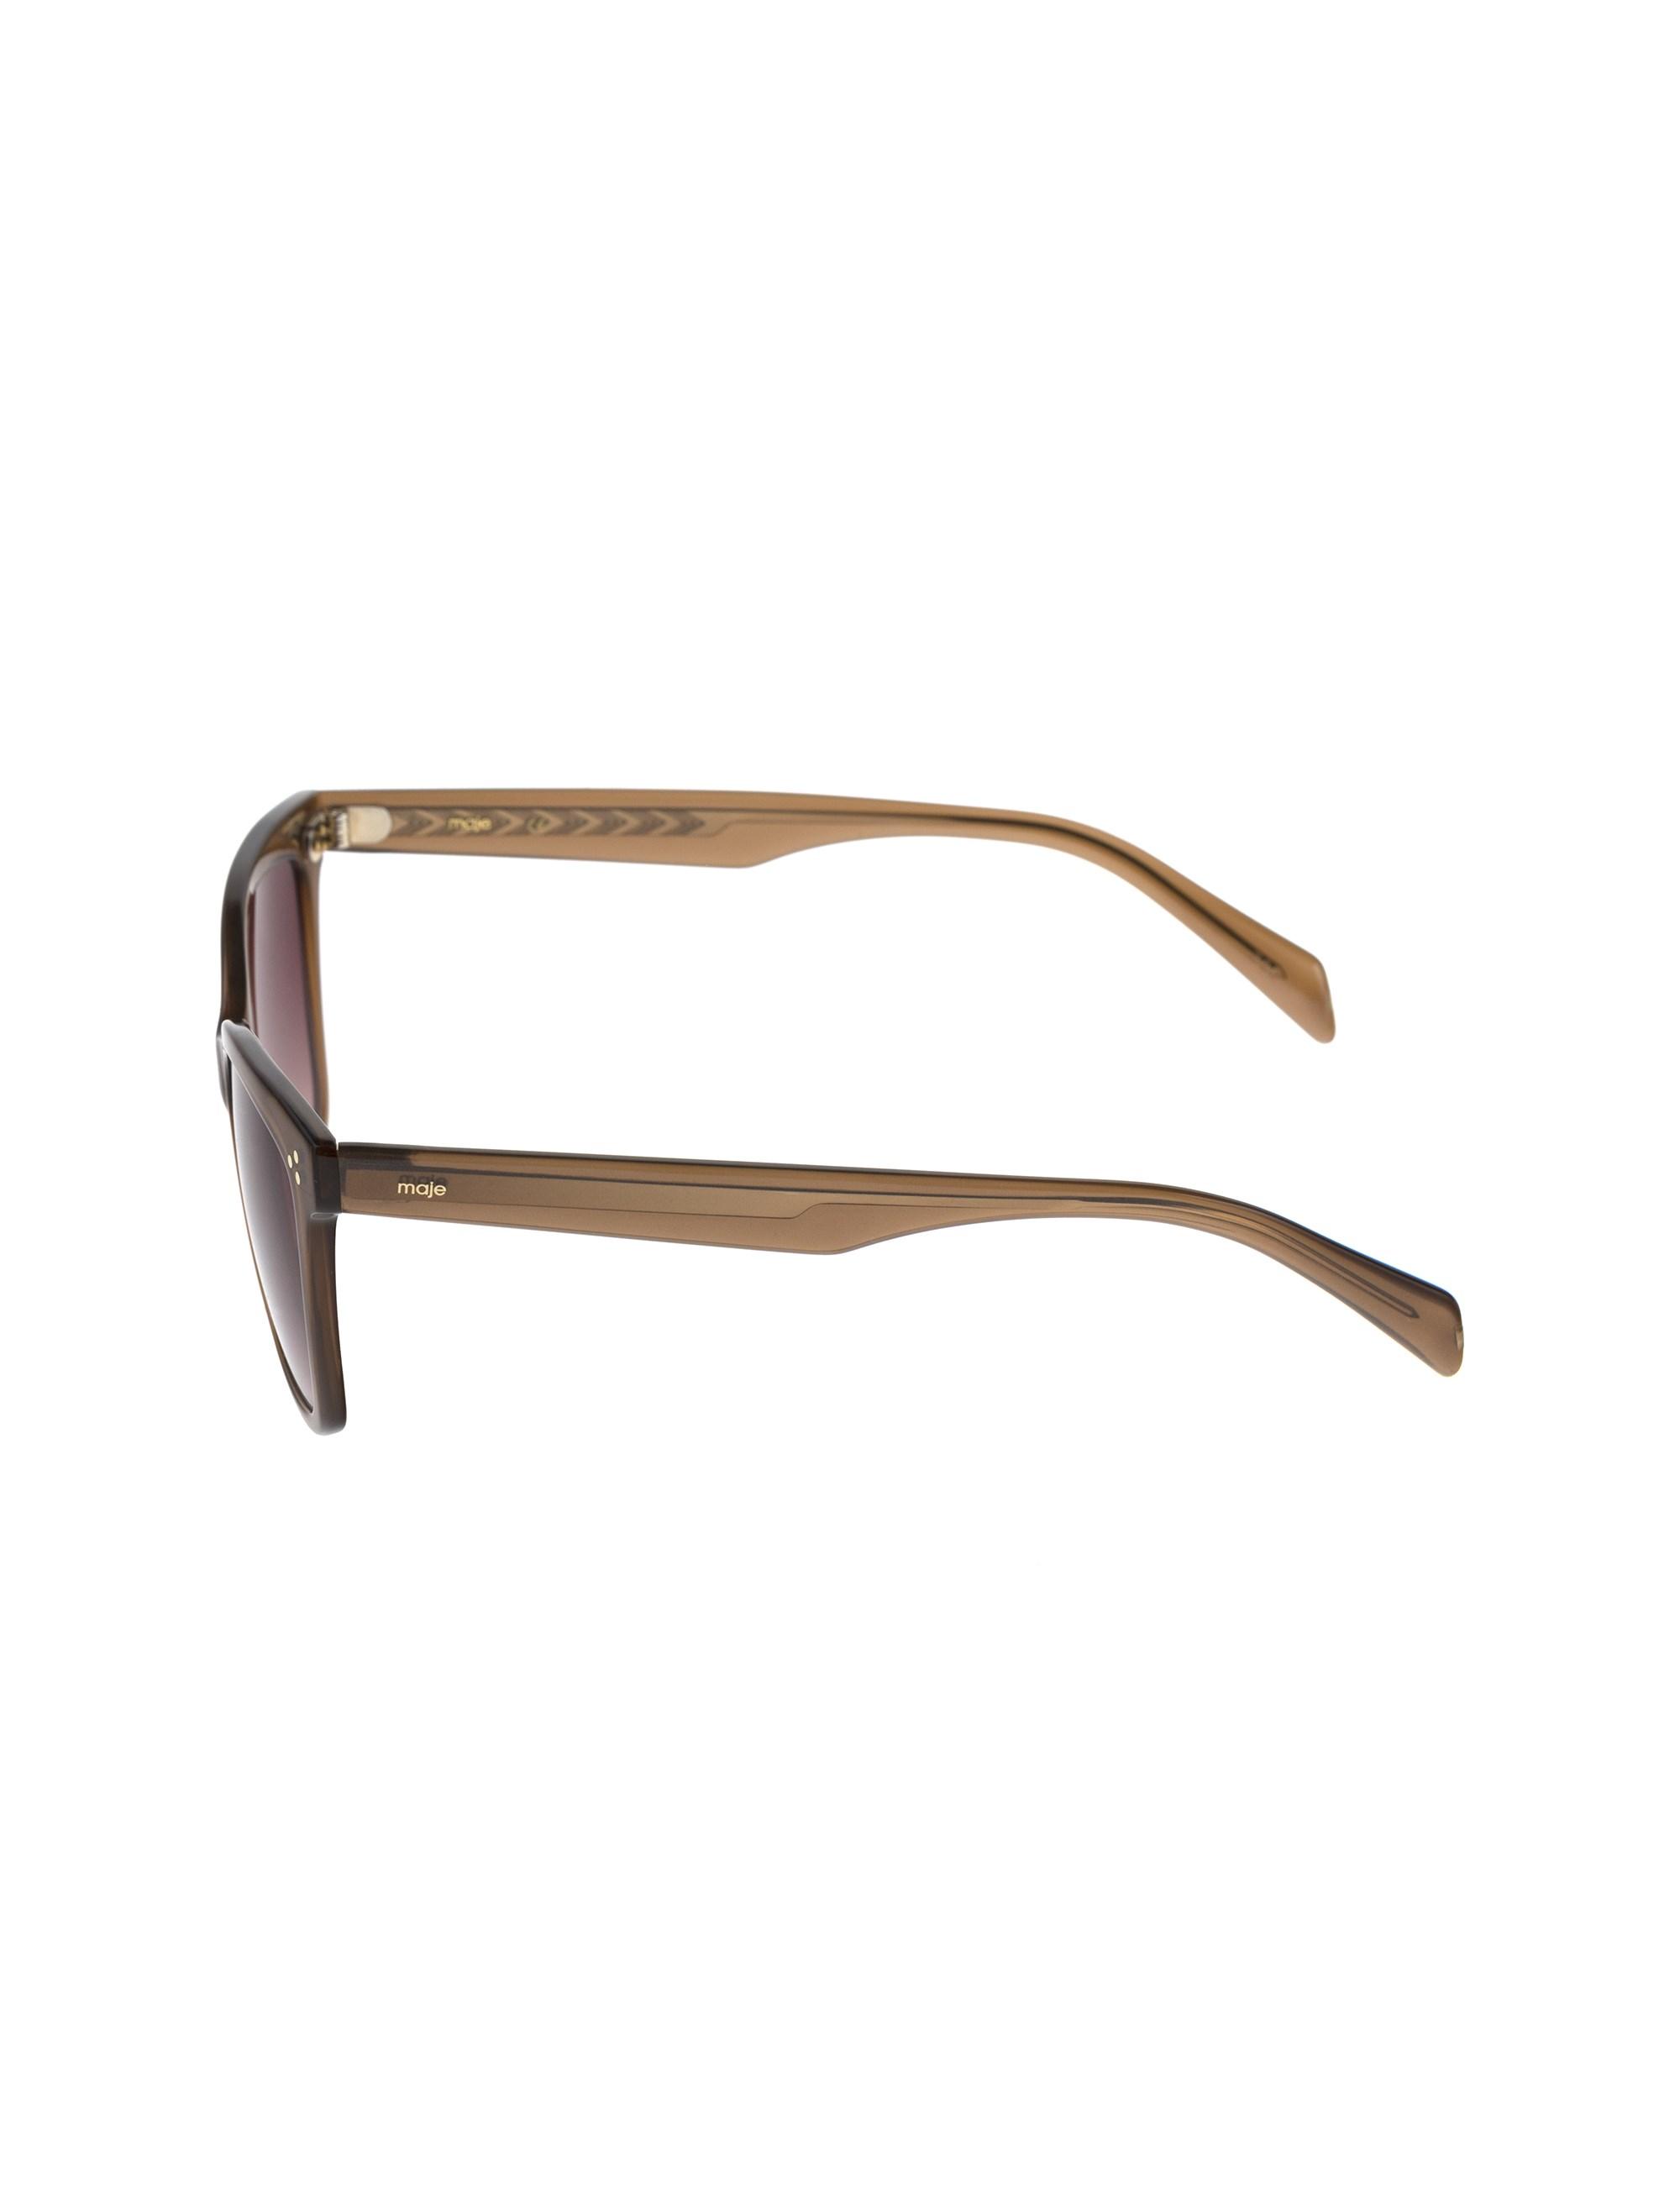 عینک آفتابی ویفرر زنانه - ماژ